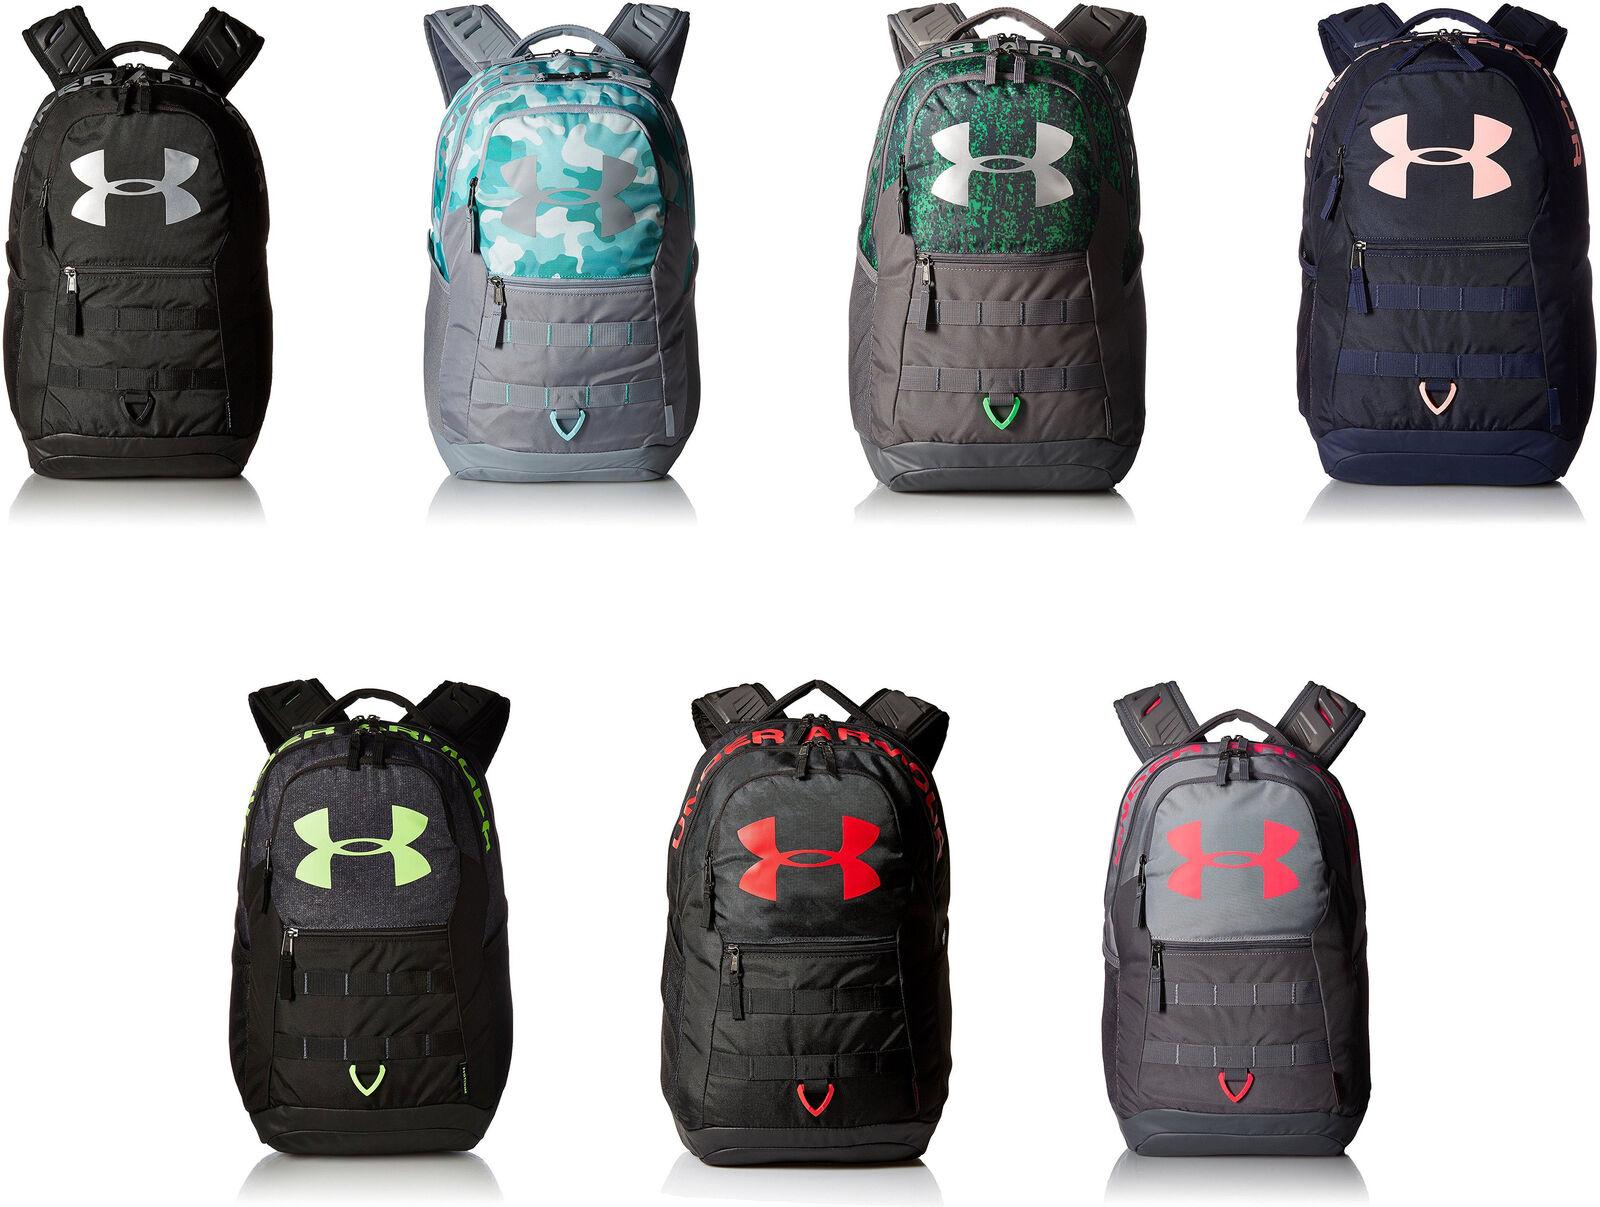 b7d5eb3aca Under Armour Unisex Big Logo 5.0 Backpack, 7 Colors | eBay